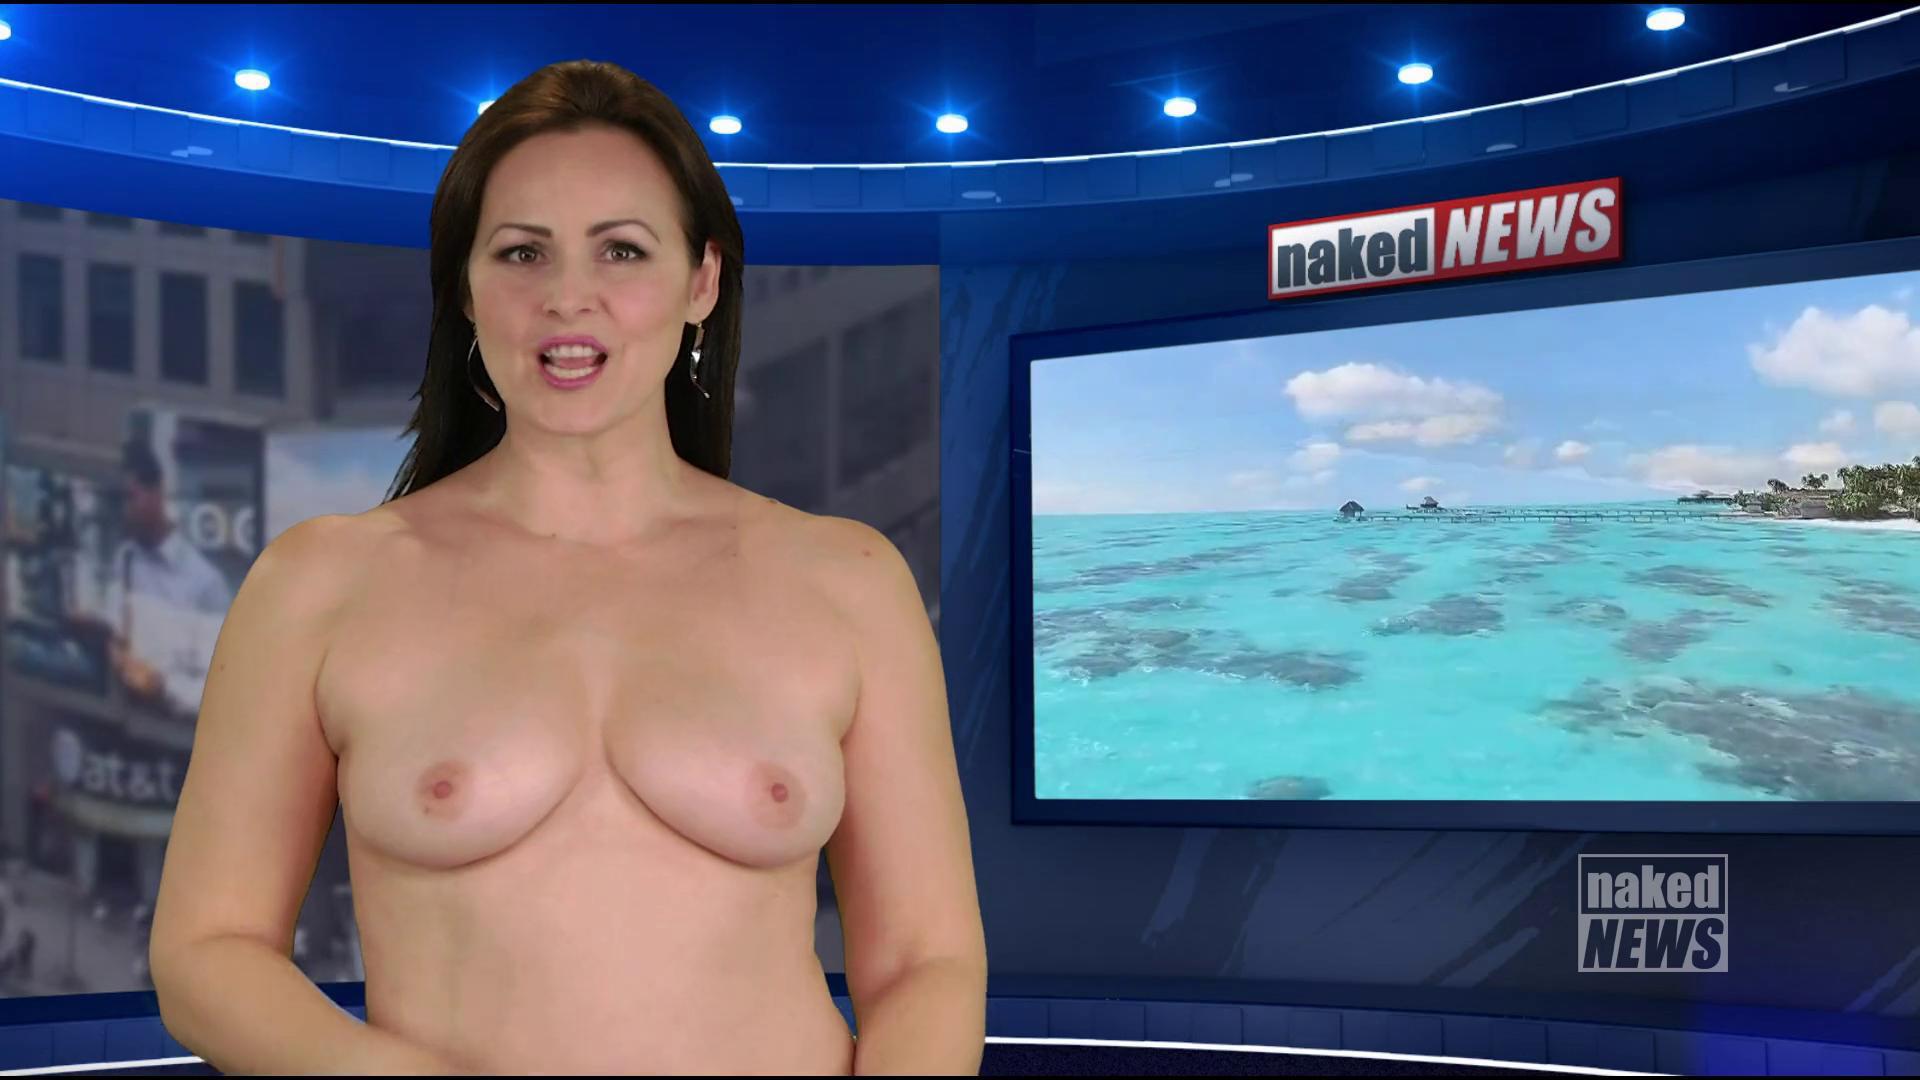 Victoria sinclair nude video — photo 3